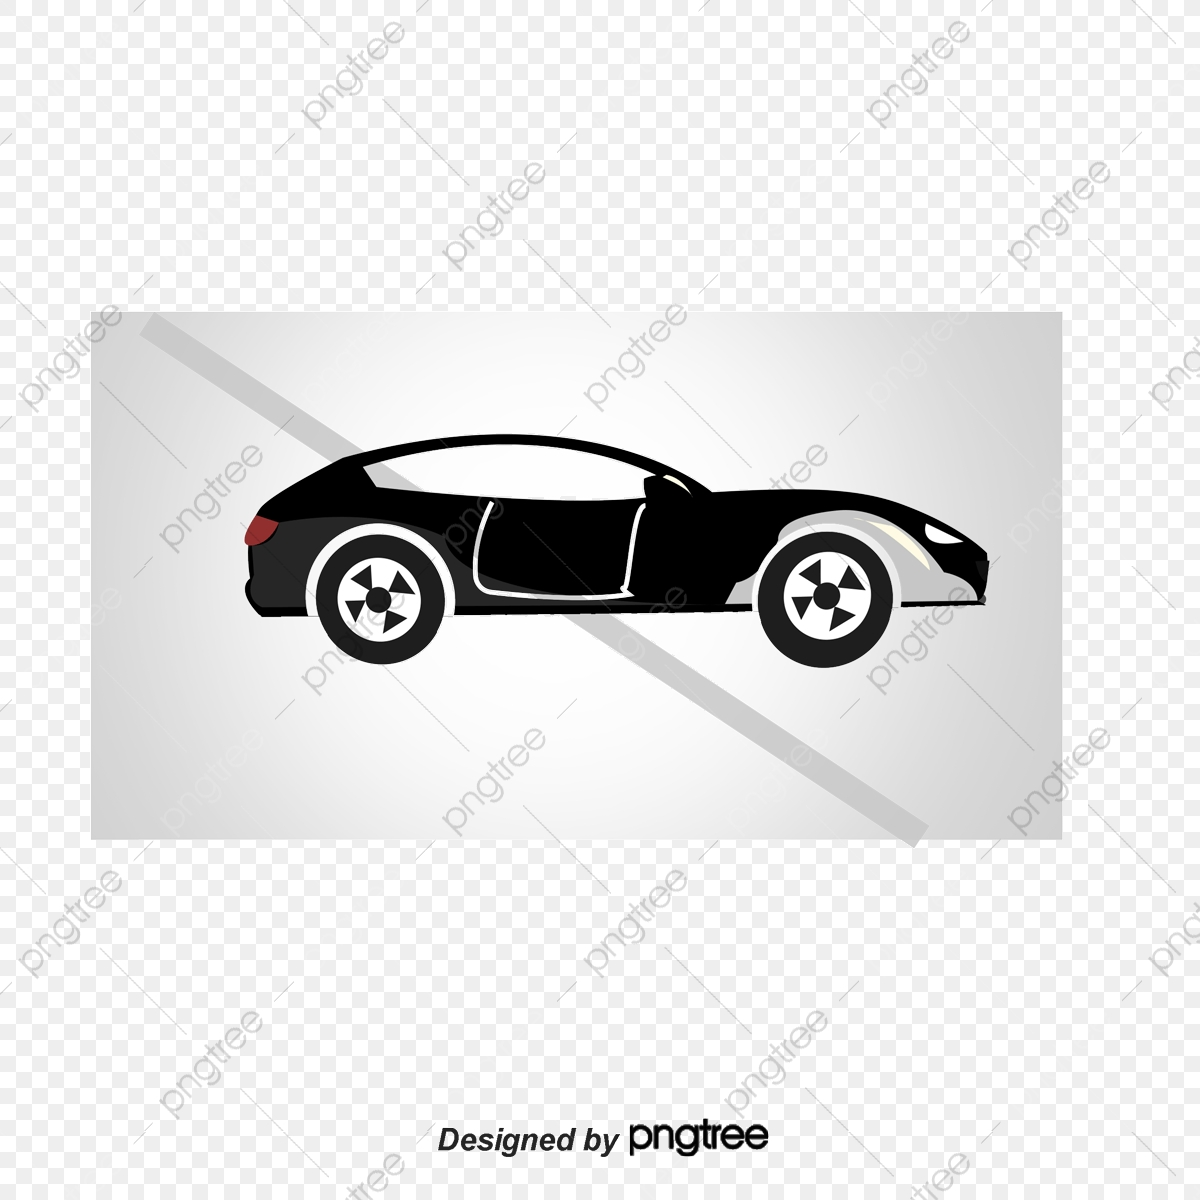 Car Profile, Shape, Fashion PNG Transparent Clipart Image and PSD.